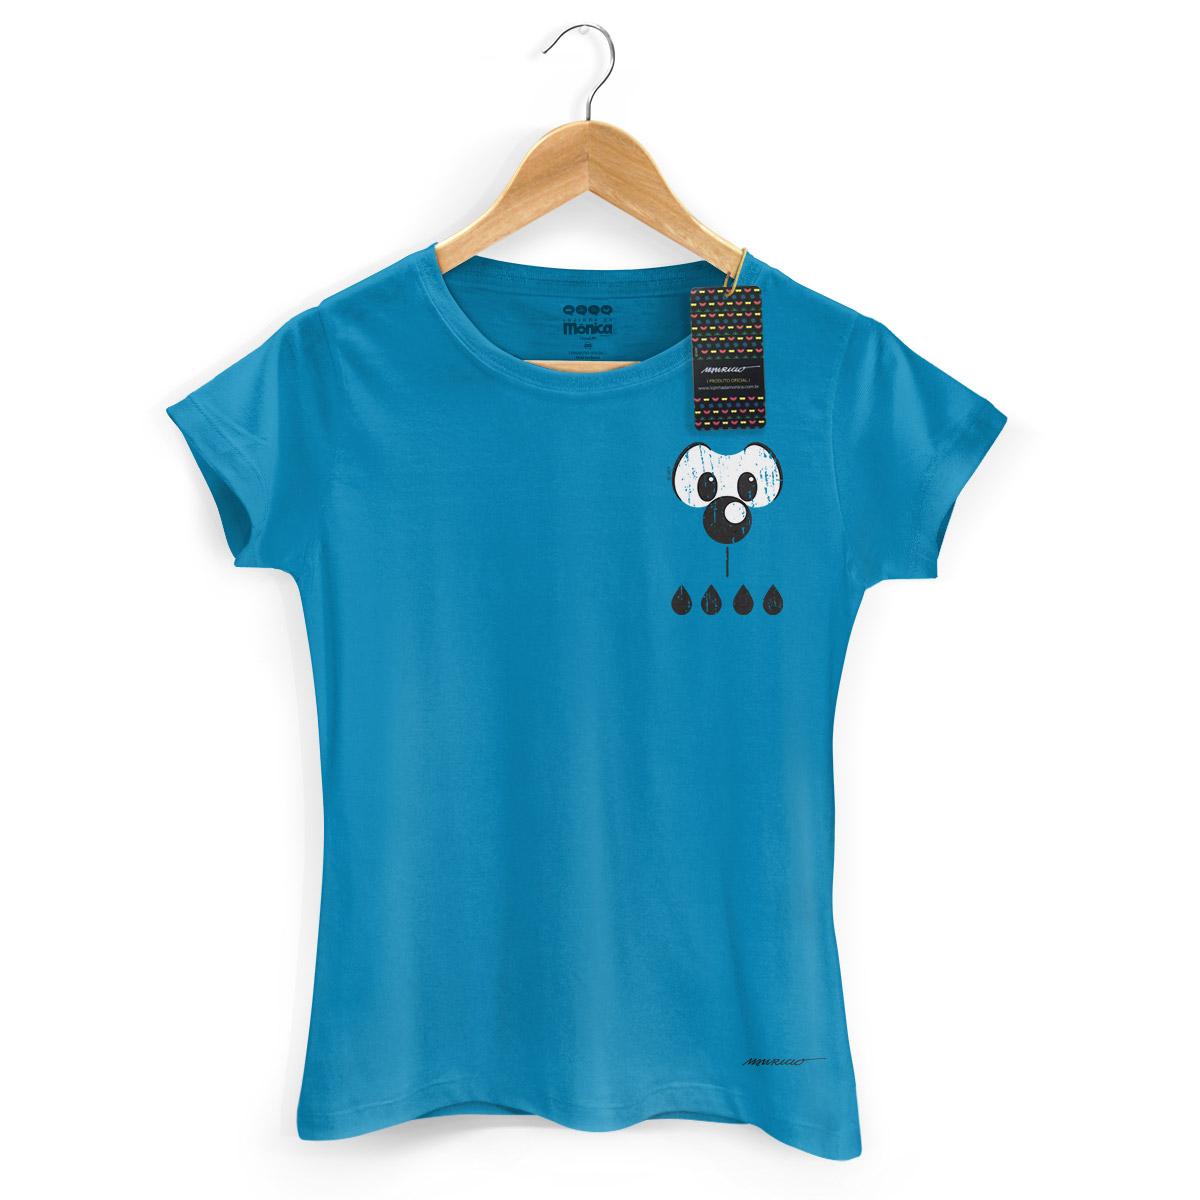 Camiseta Feminina Turma da Mônica Cool Olhões Bidu